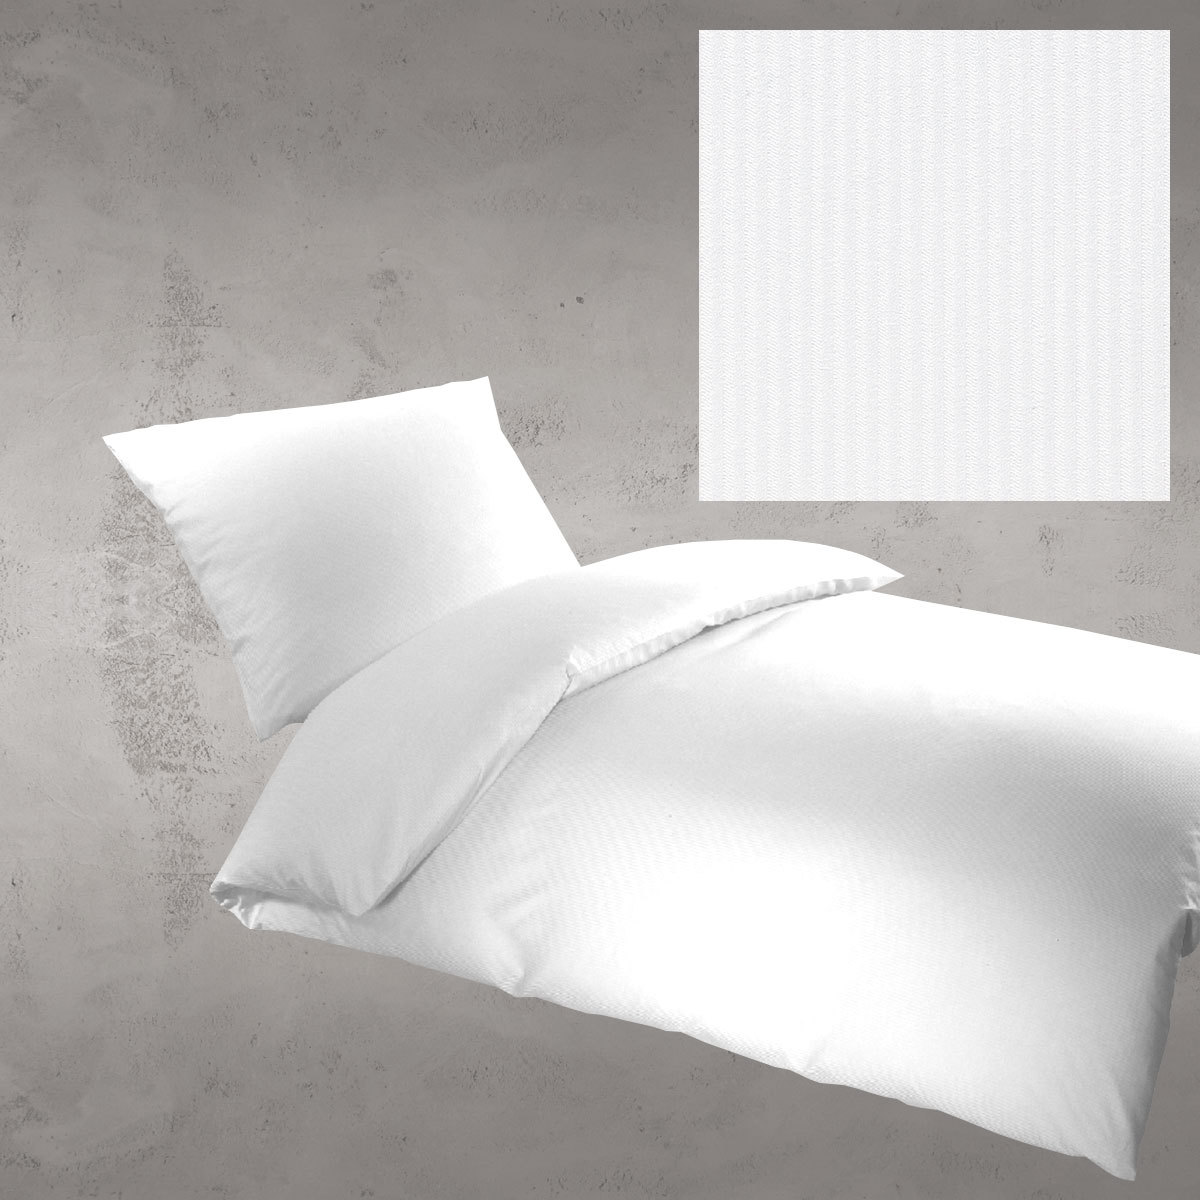 bettwarenshop damast objekt bettw sche laura 2mm weiss g nstig online kaufen bei bettwaren shop. Black Bedroom Furniture Sets. Home Design Ideas